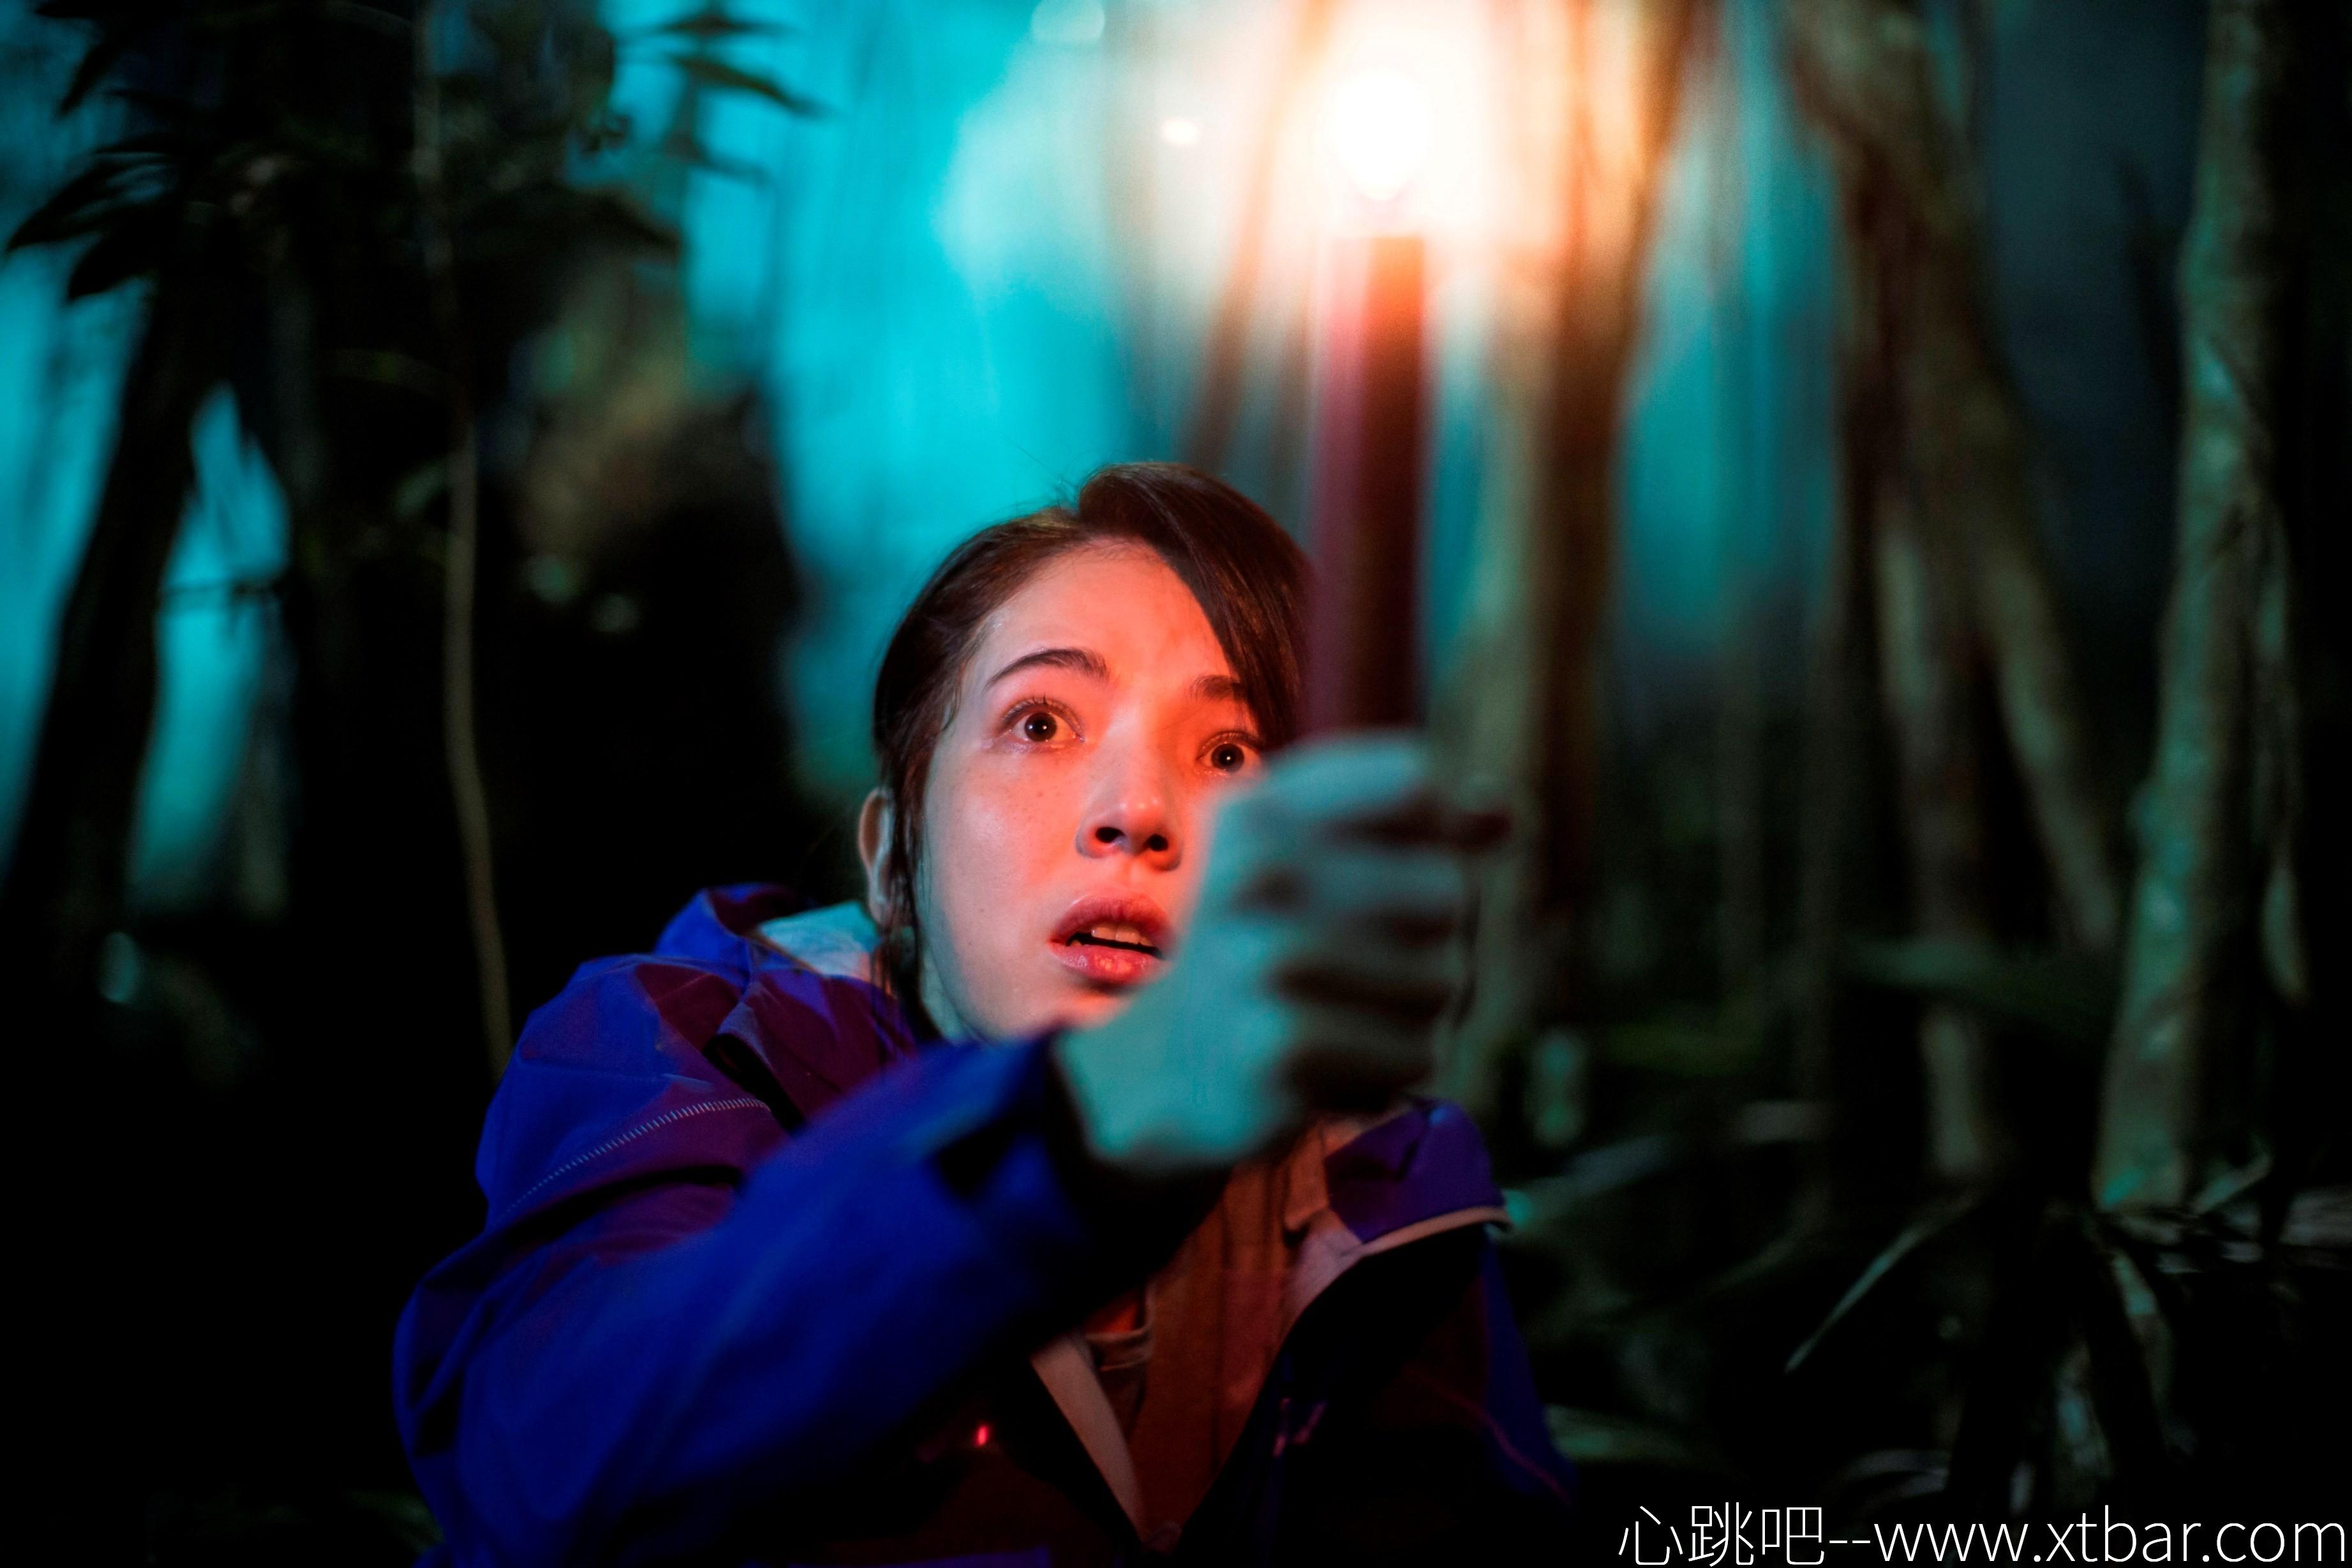 0085j6oIly1gl54zwtn9lj32ue1wakhg - [心跳吧恐怖片推荐]:《红衣小女孩》,找到内心最原始的恐惧!